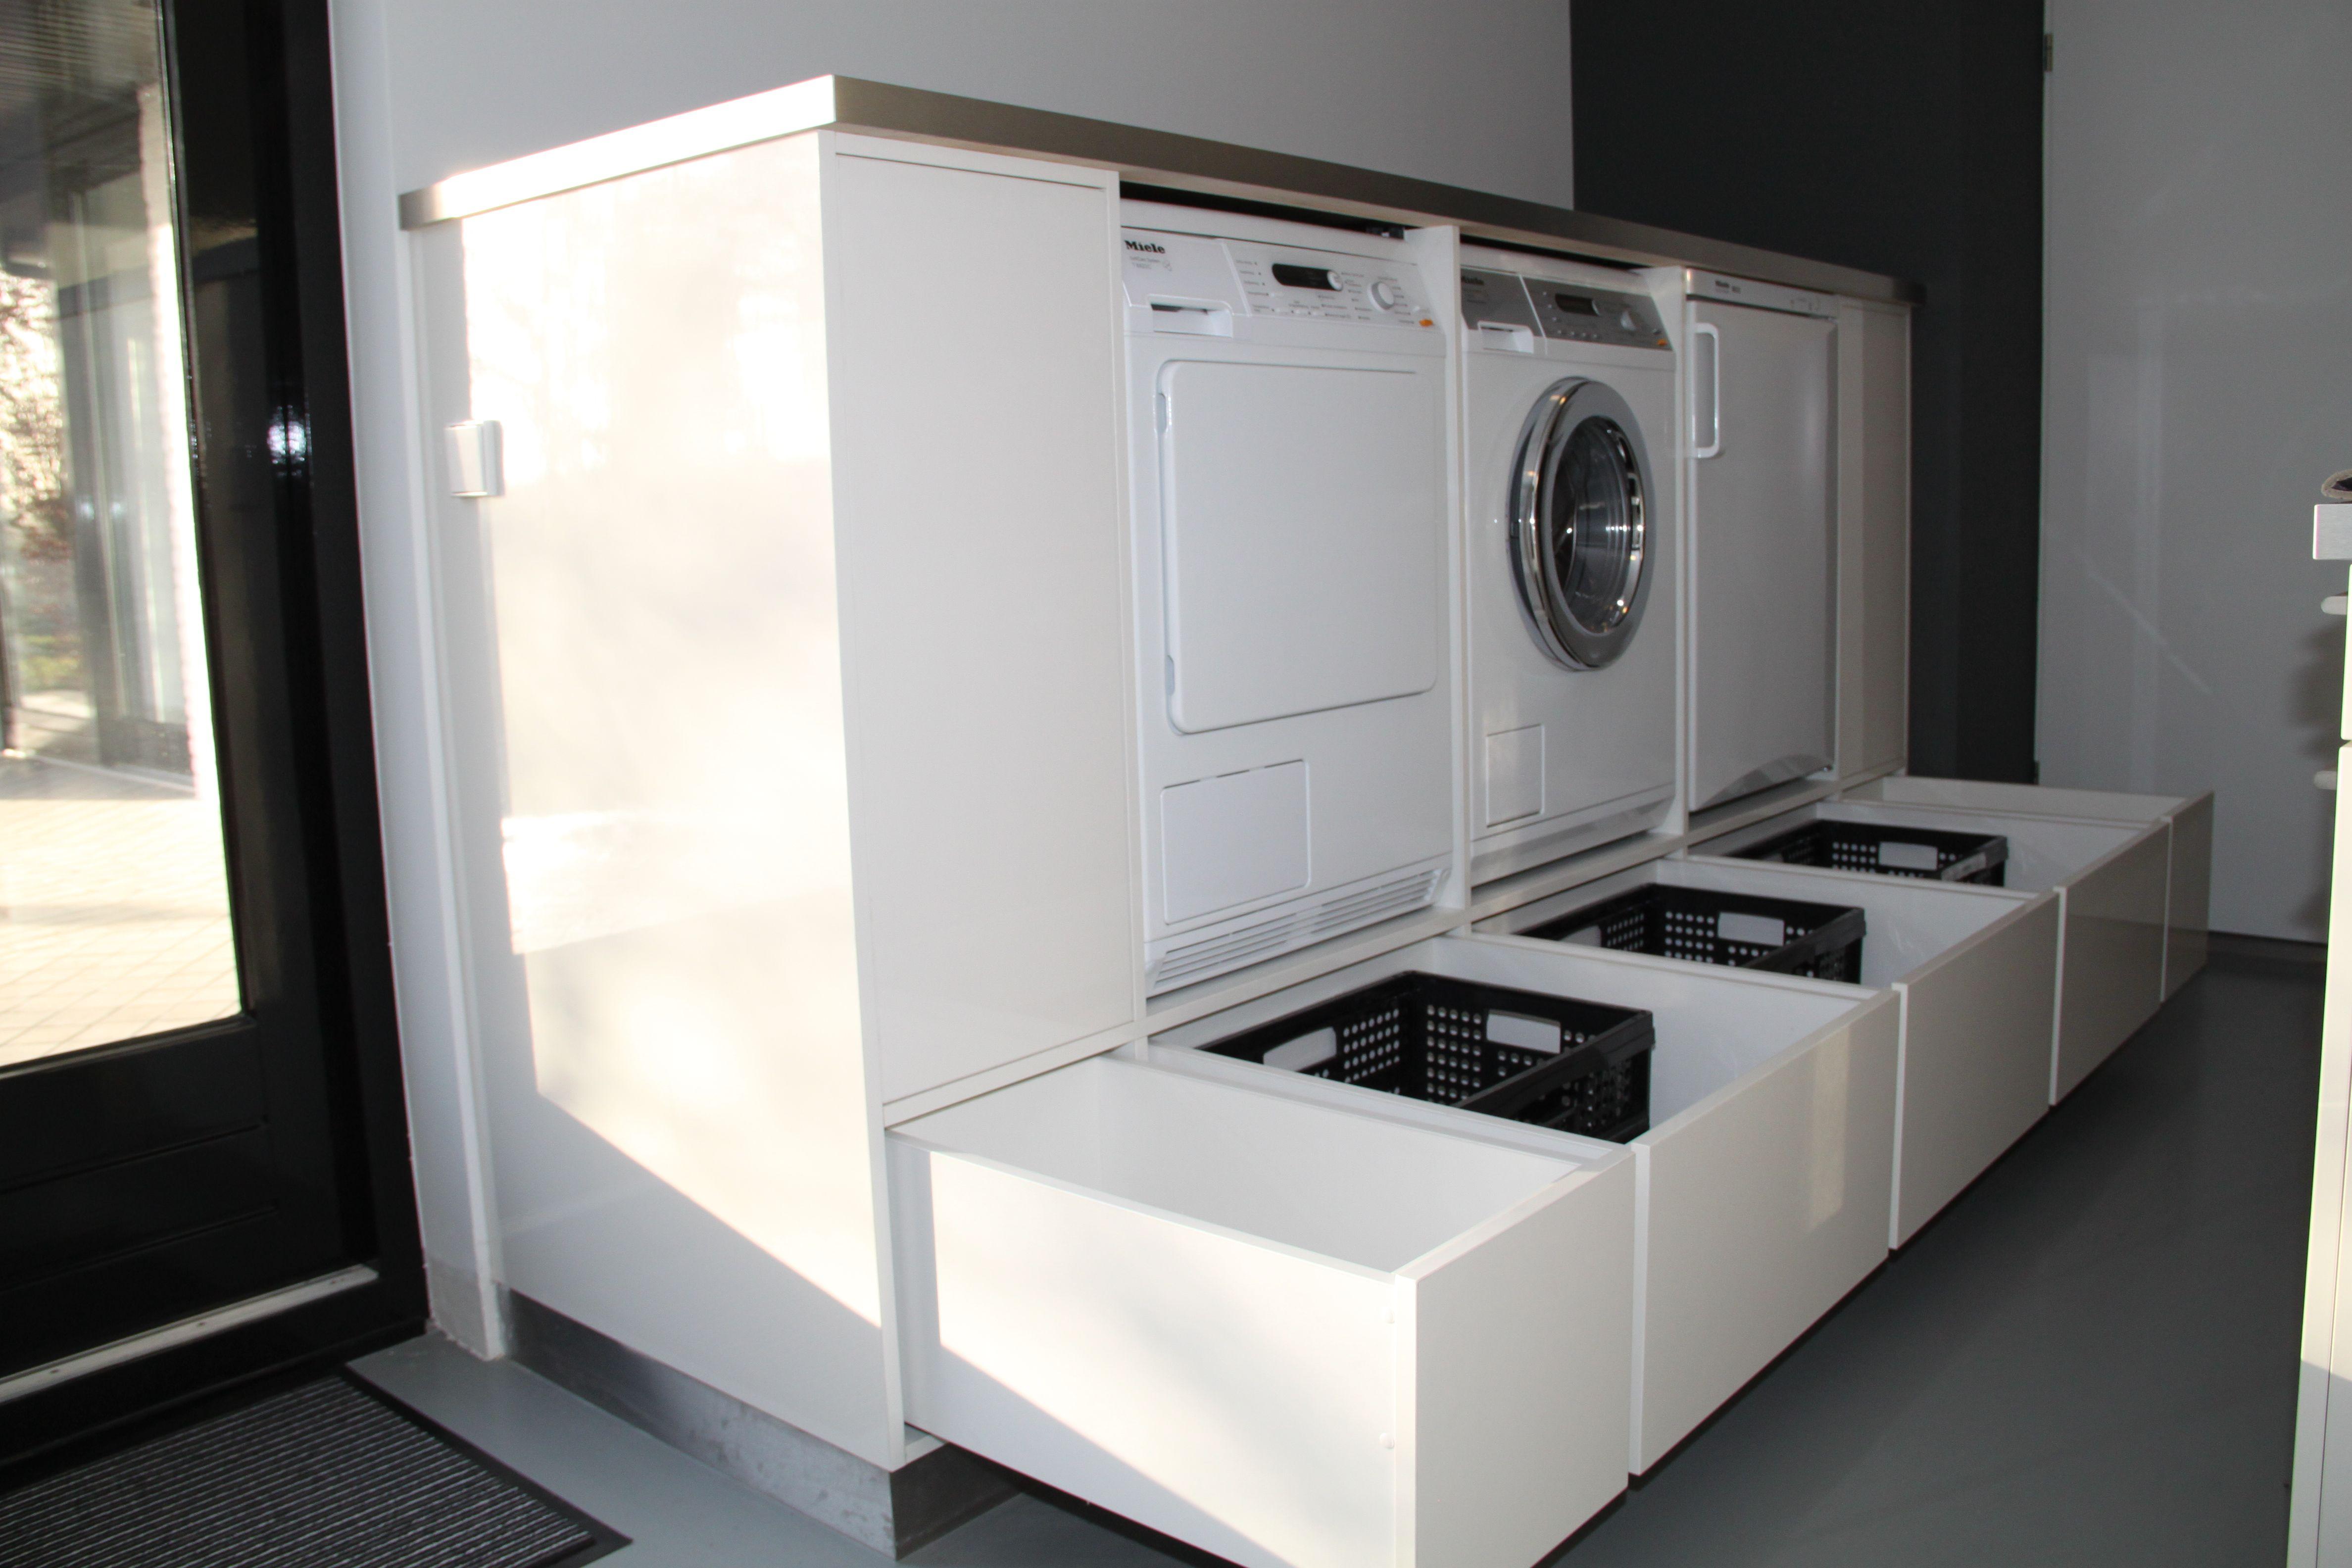 Wasmachine Kast Google Zoeken Maison Wasruimtes